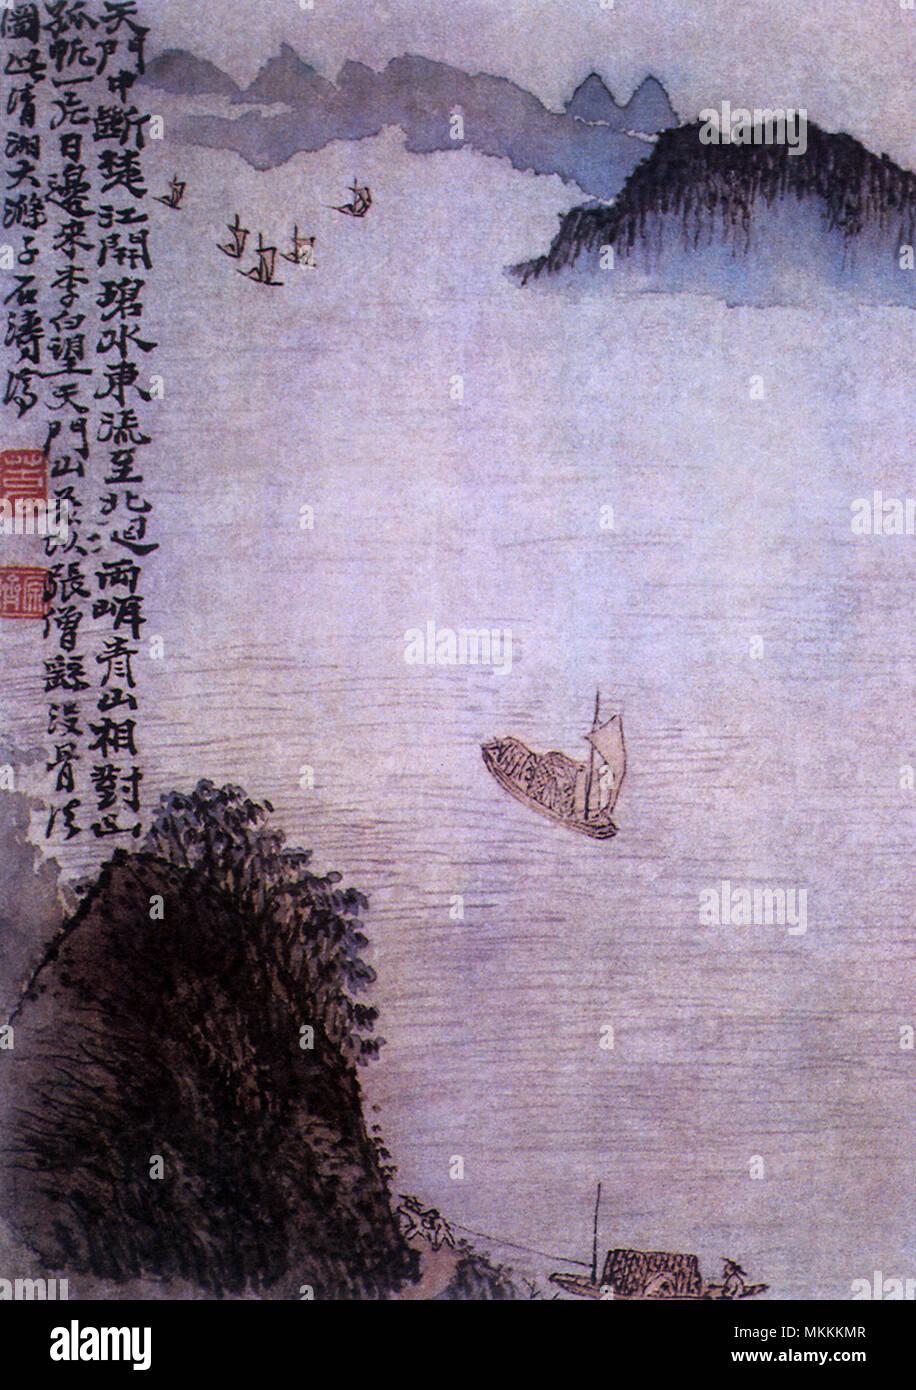 Poetic Landscape - Stock Image